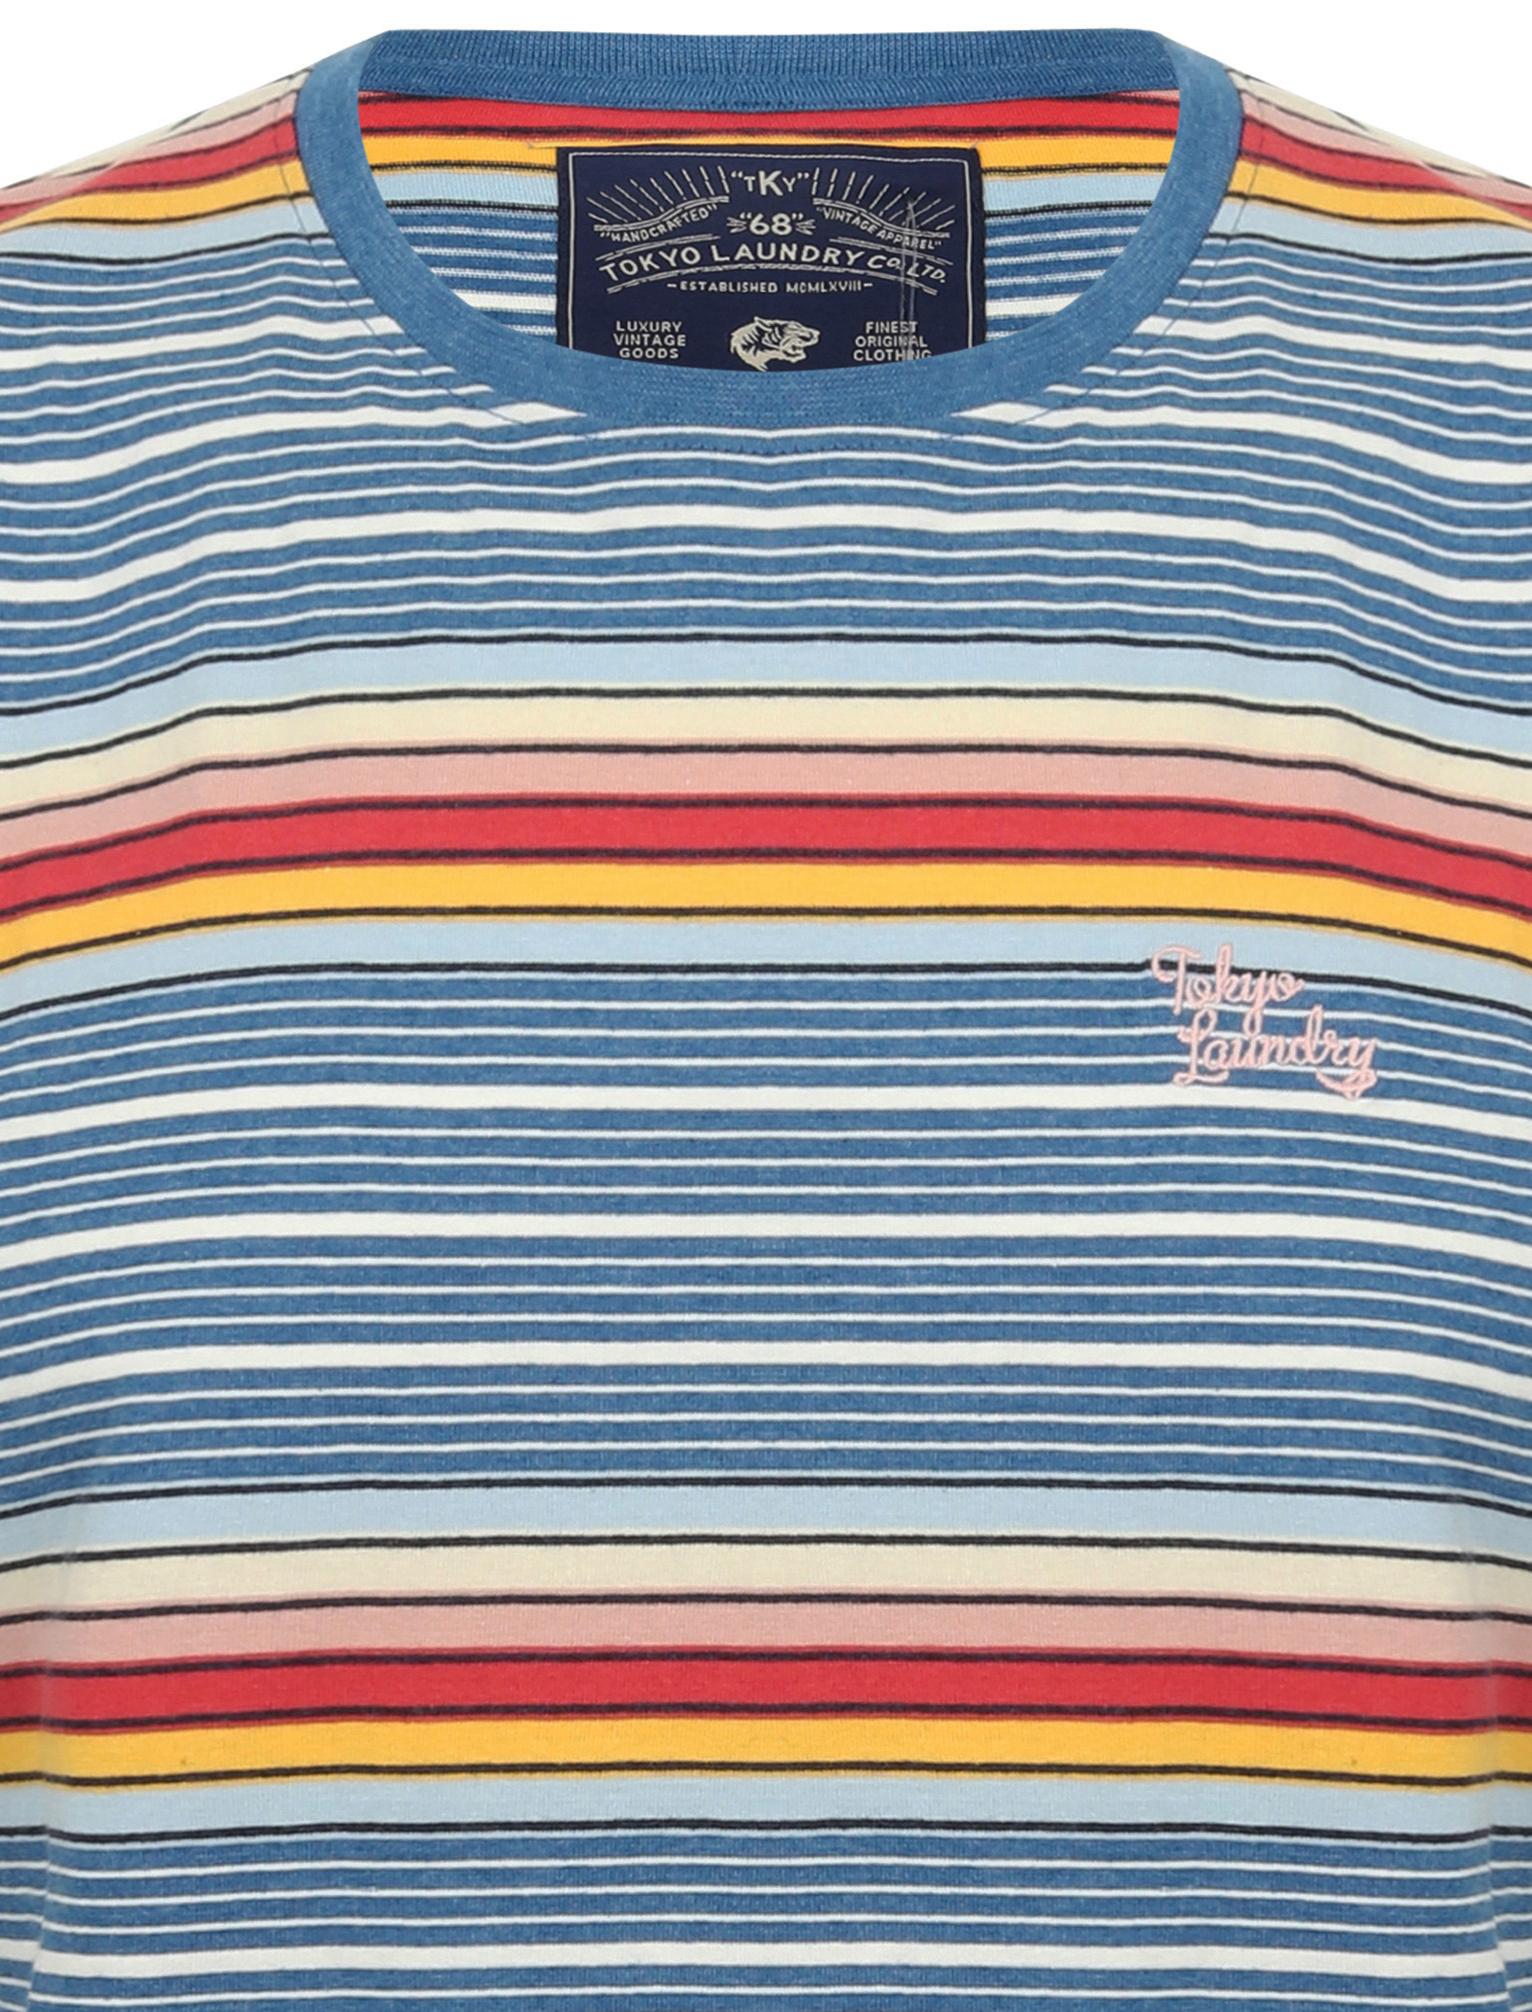 Tokyo-Laundry-Men-039-s-Lowell-Crew-Neck-Striped-T-Shirt-Stripy-Retro-Rainbow-Top thumbnail 4